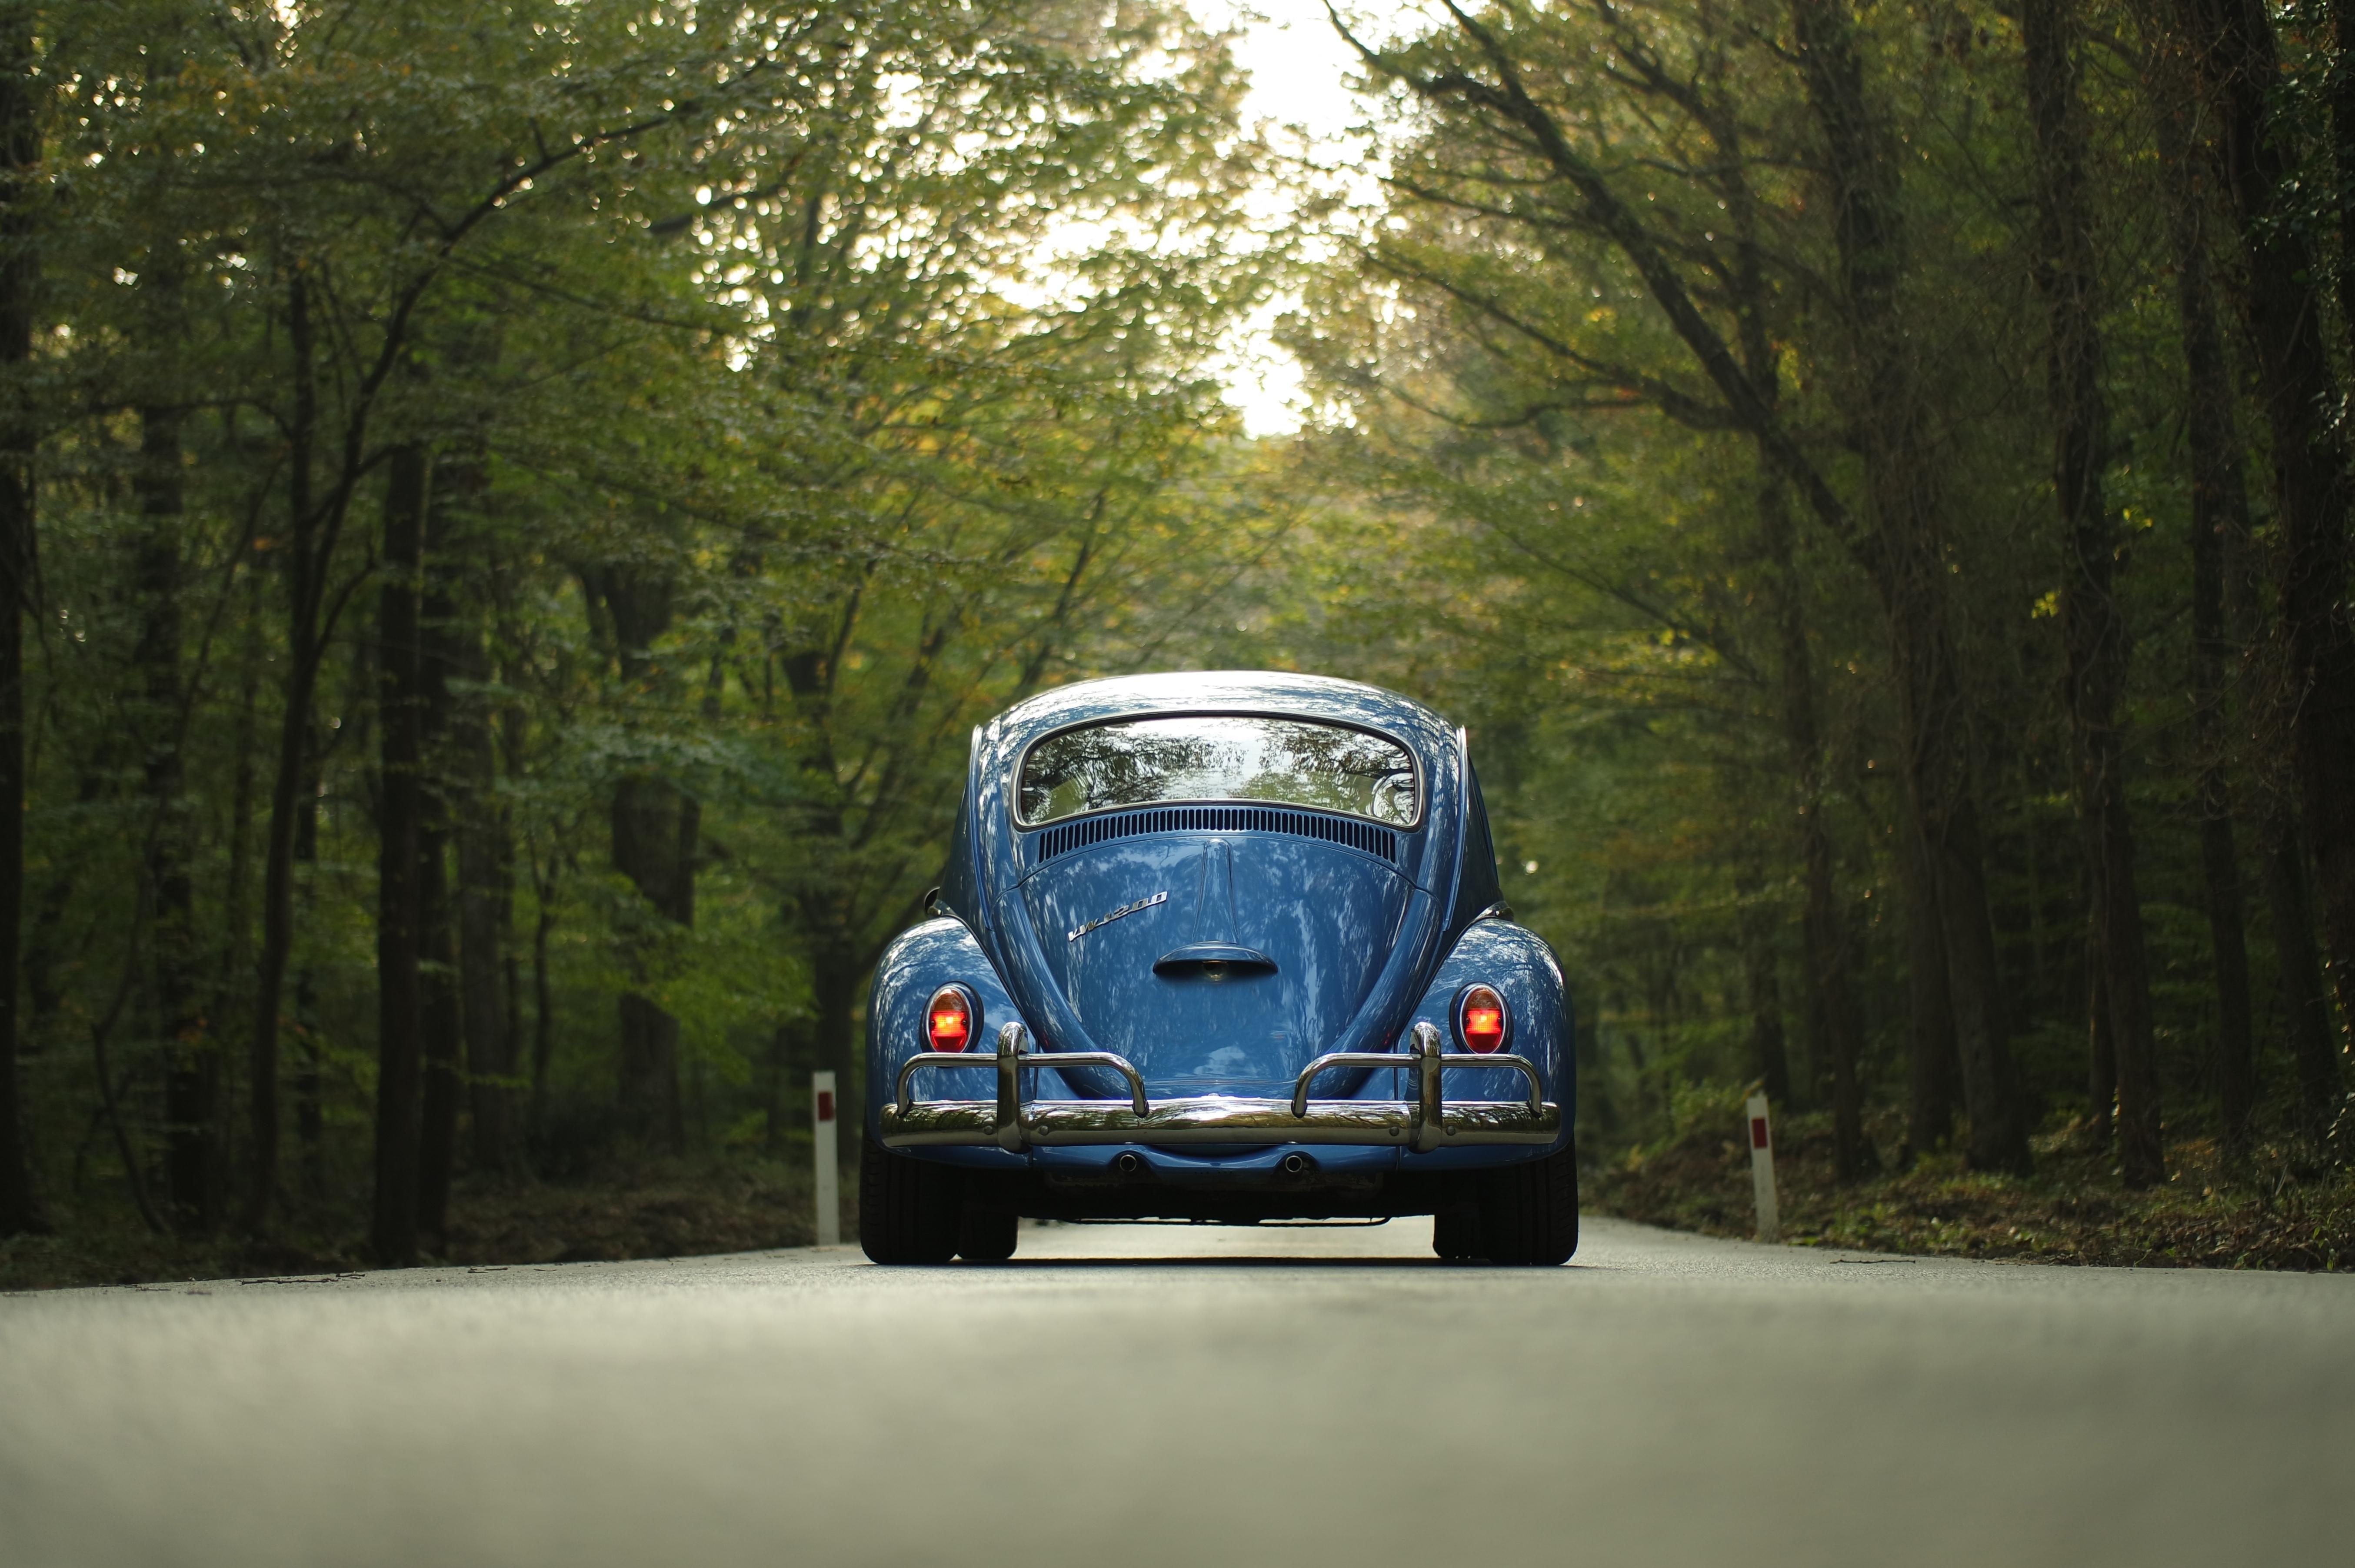 En coche, ¿solo o acompañado?